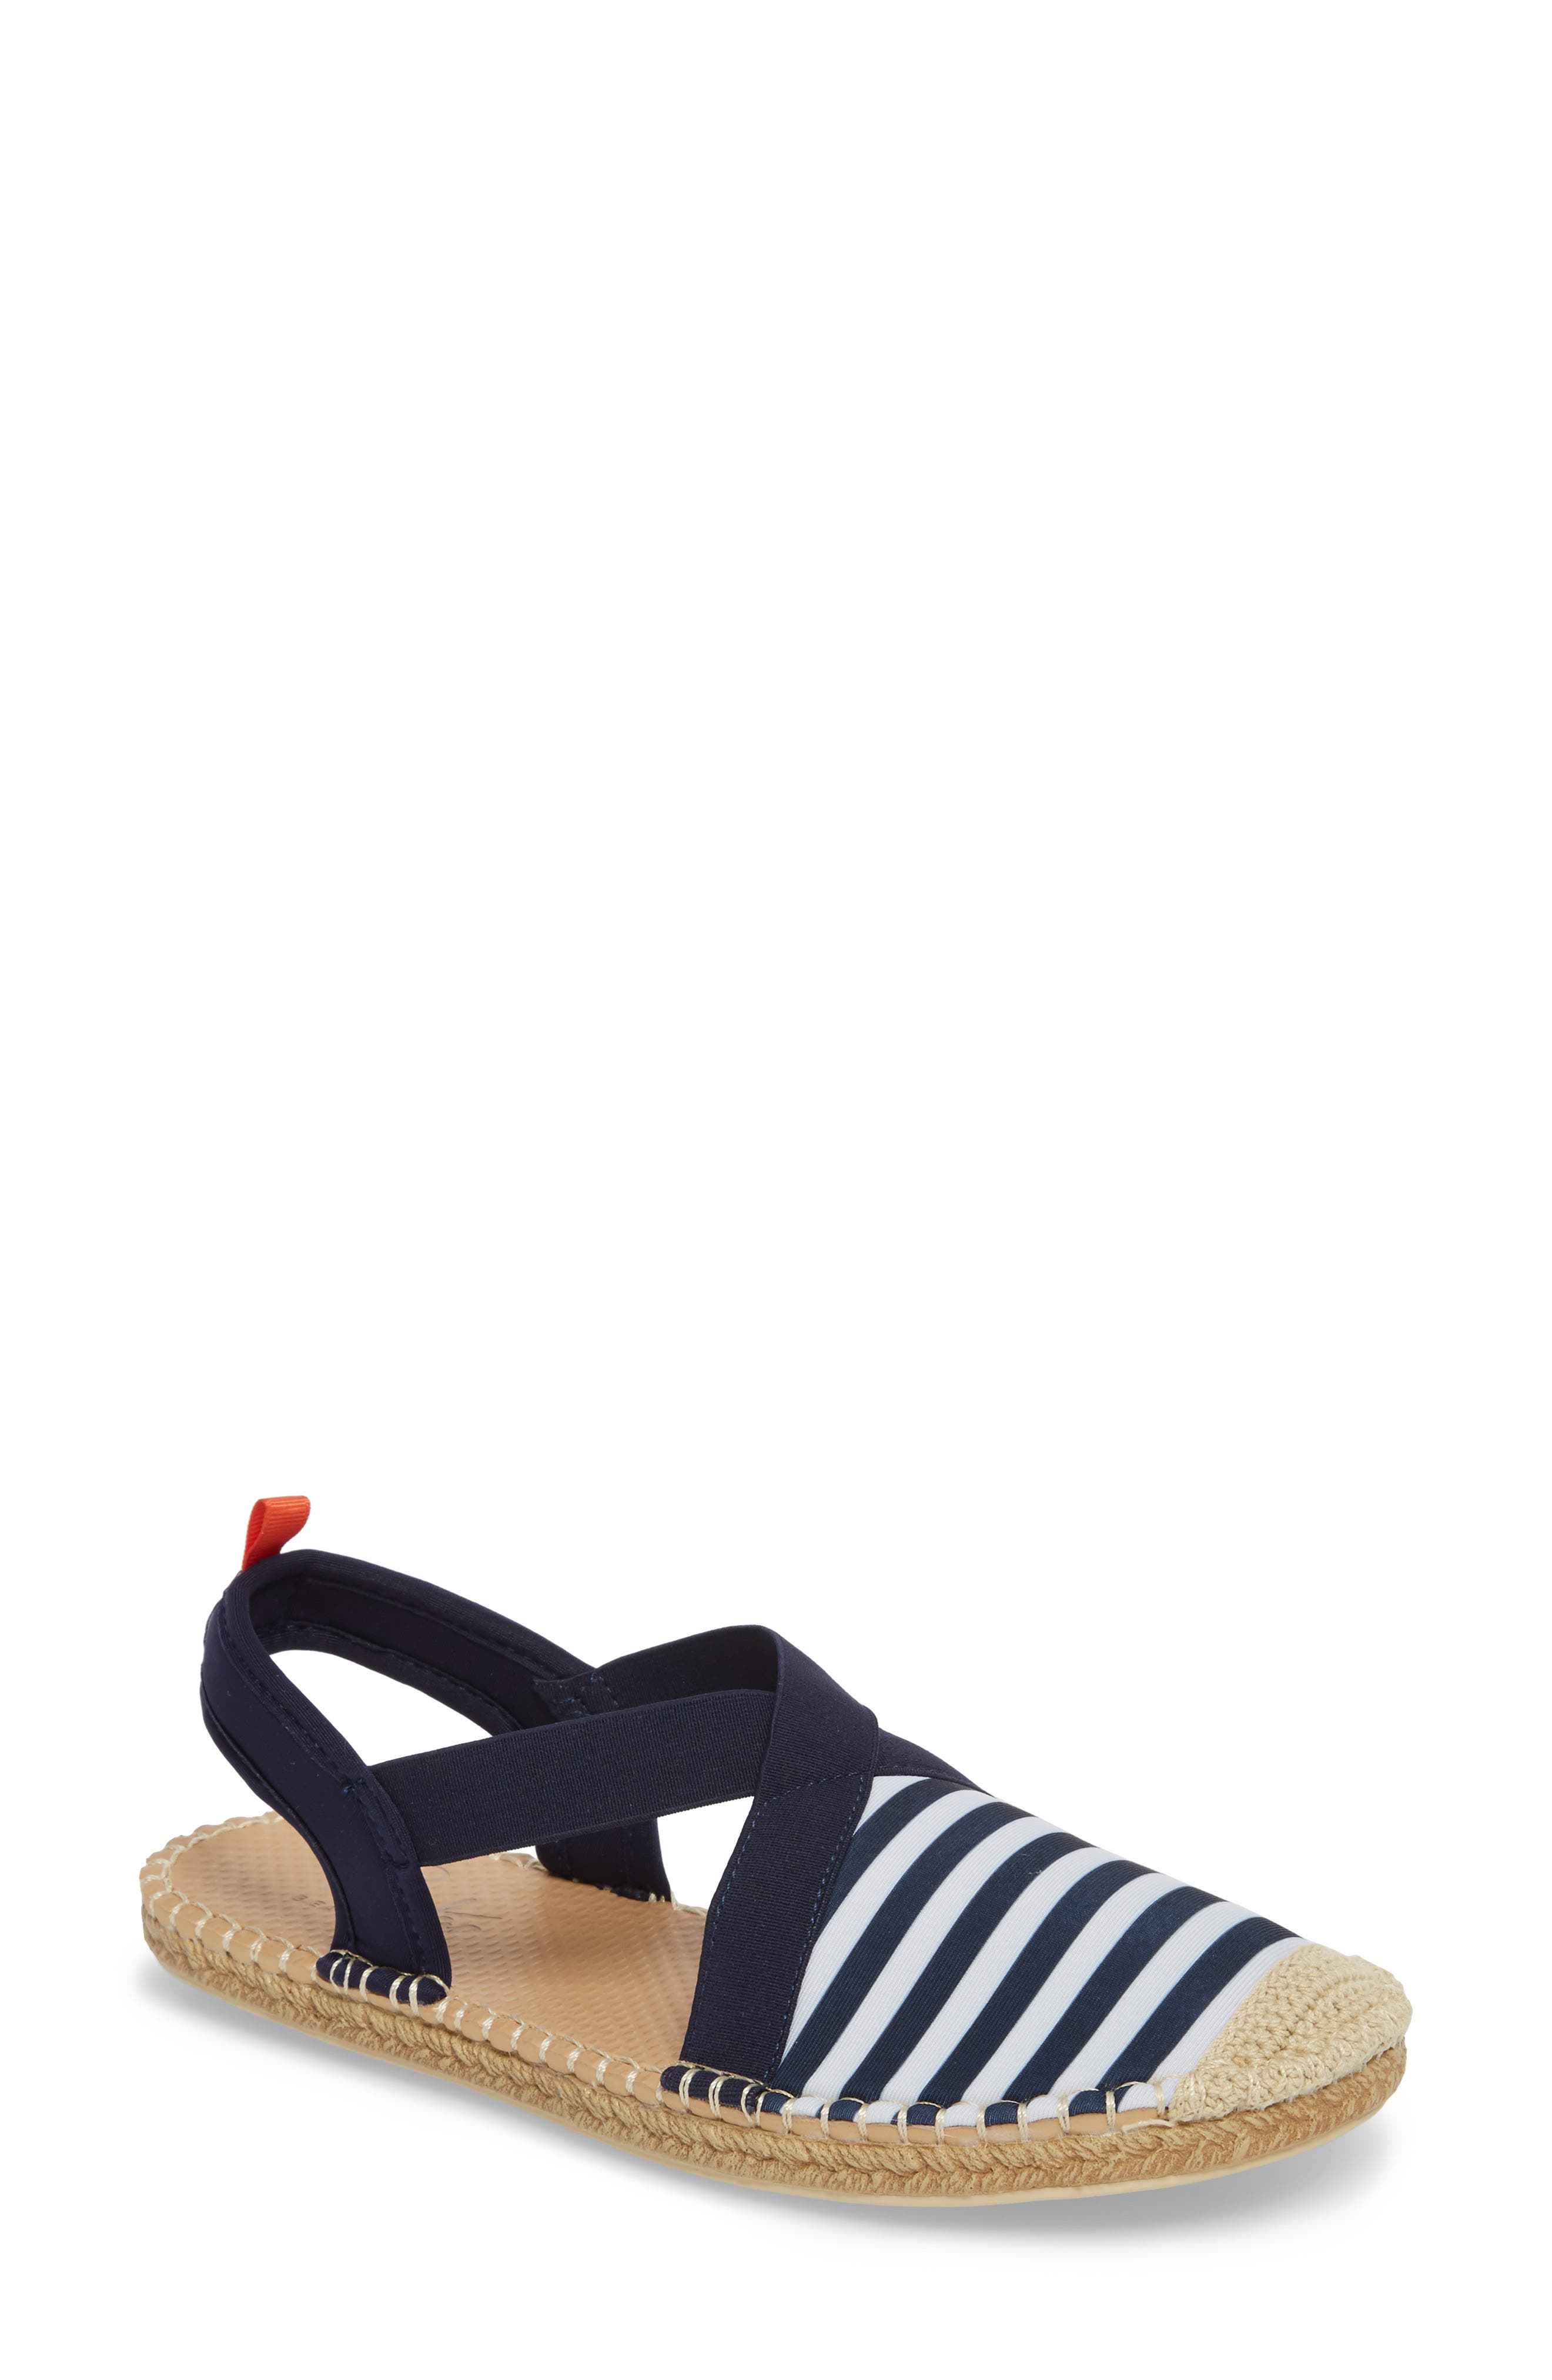 Sea Star Slingback Espadrille Water Shoe,                             Main thumbnail 1, color,                             Navy/ White Stripes